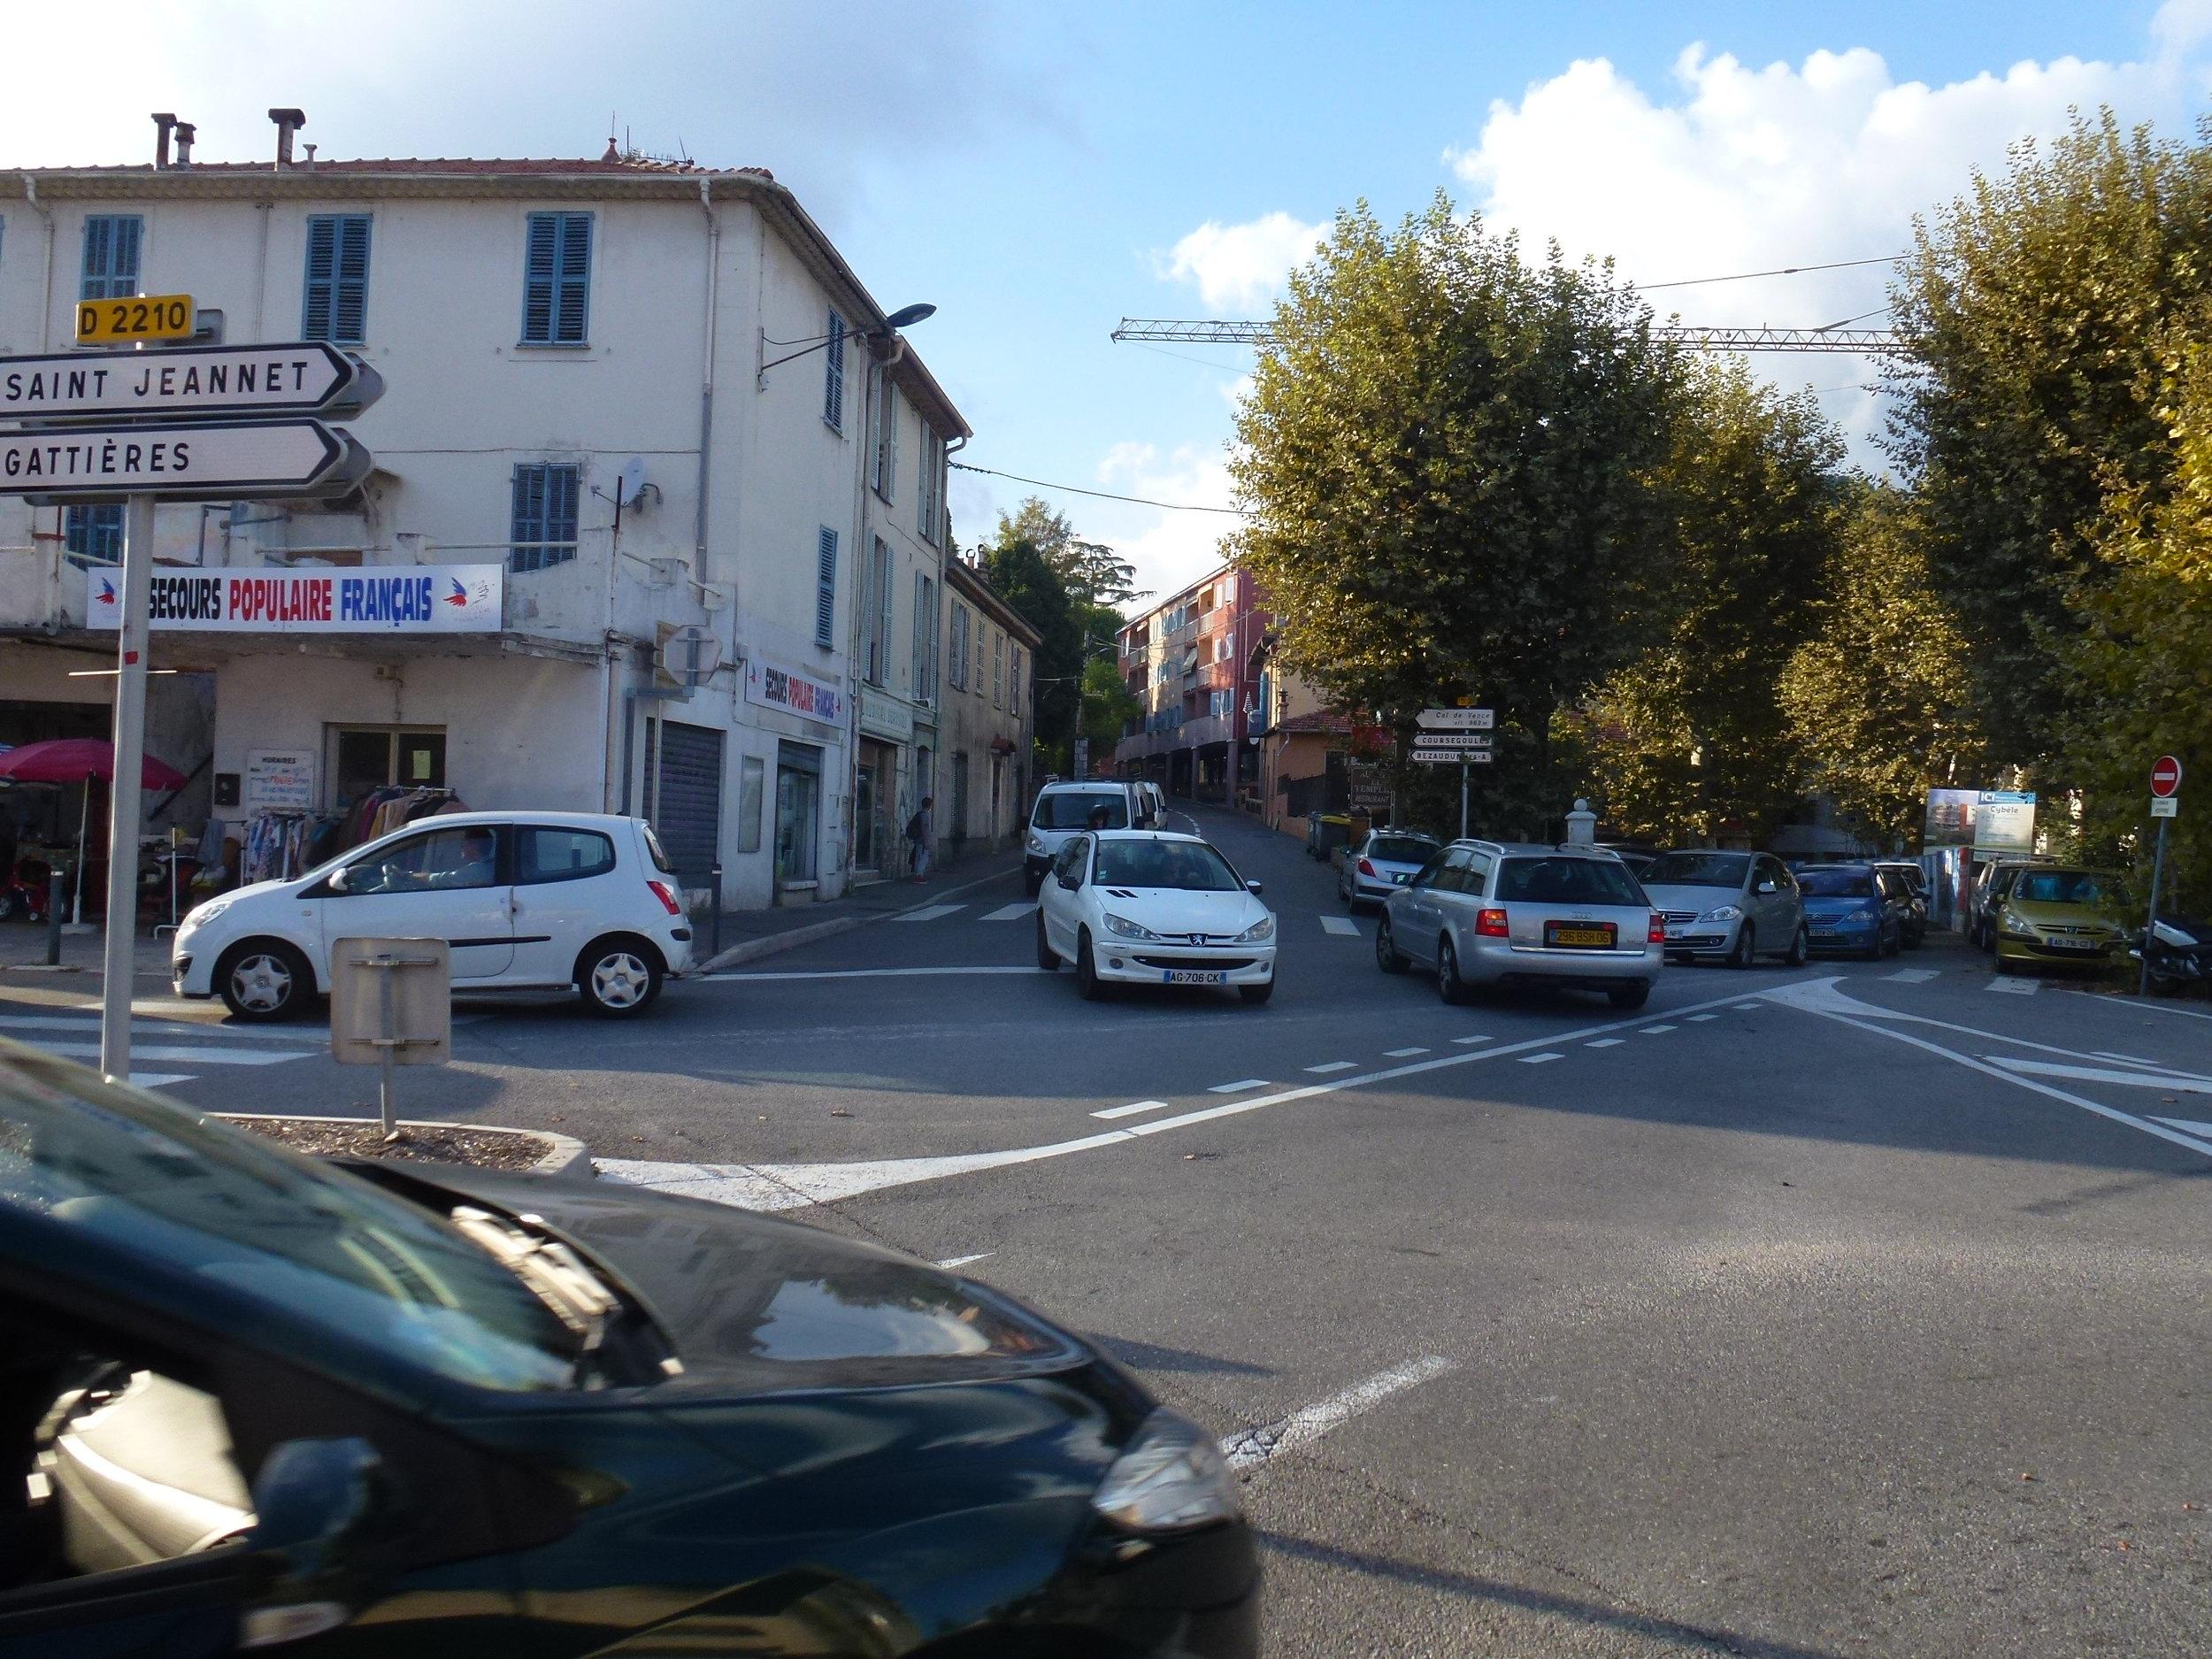 5) Croisement... - This crossing...